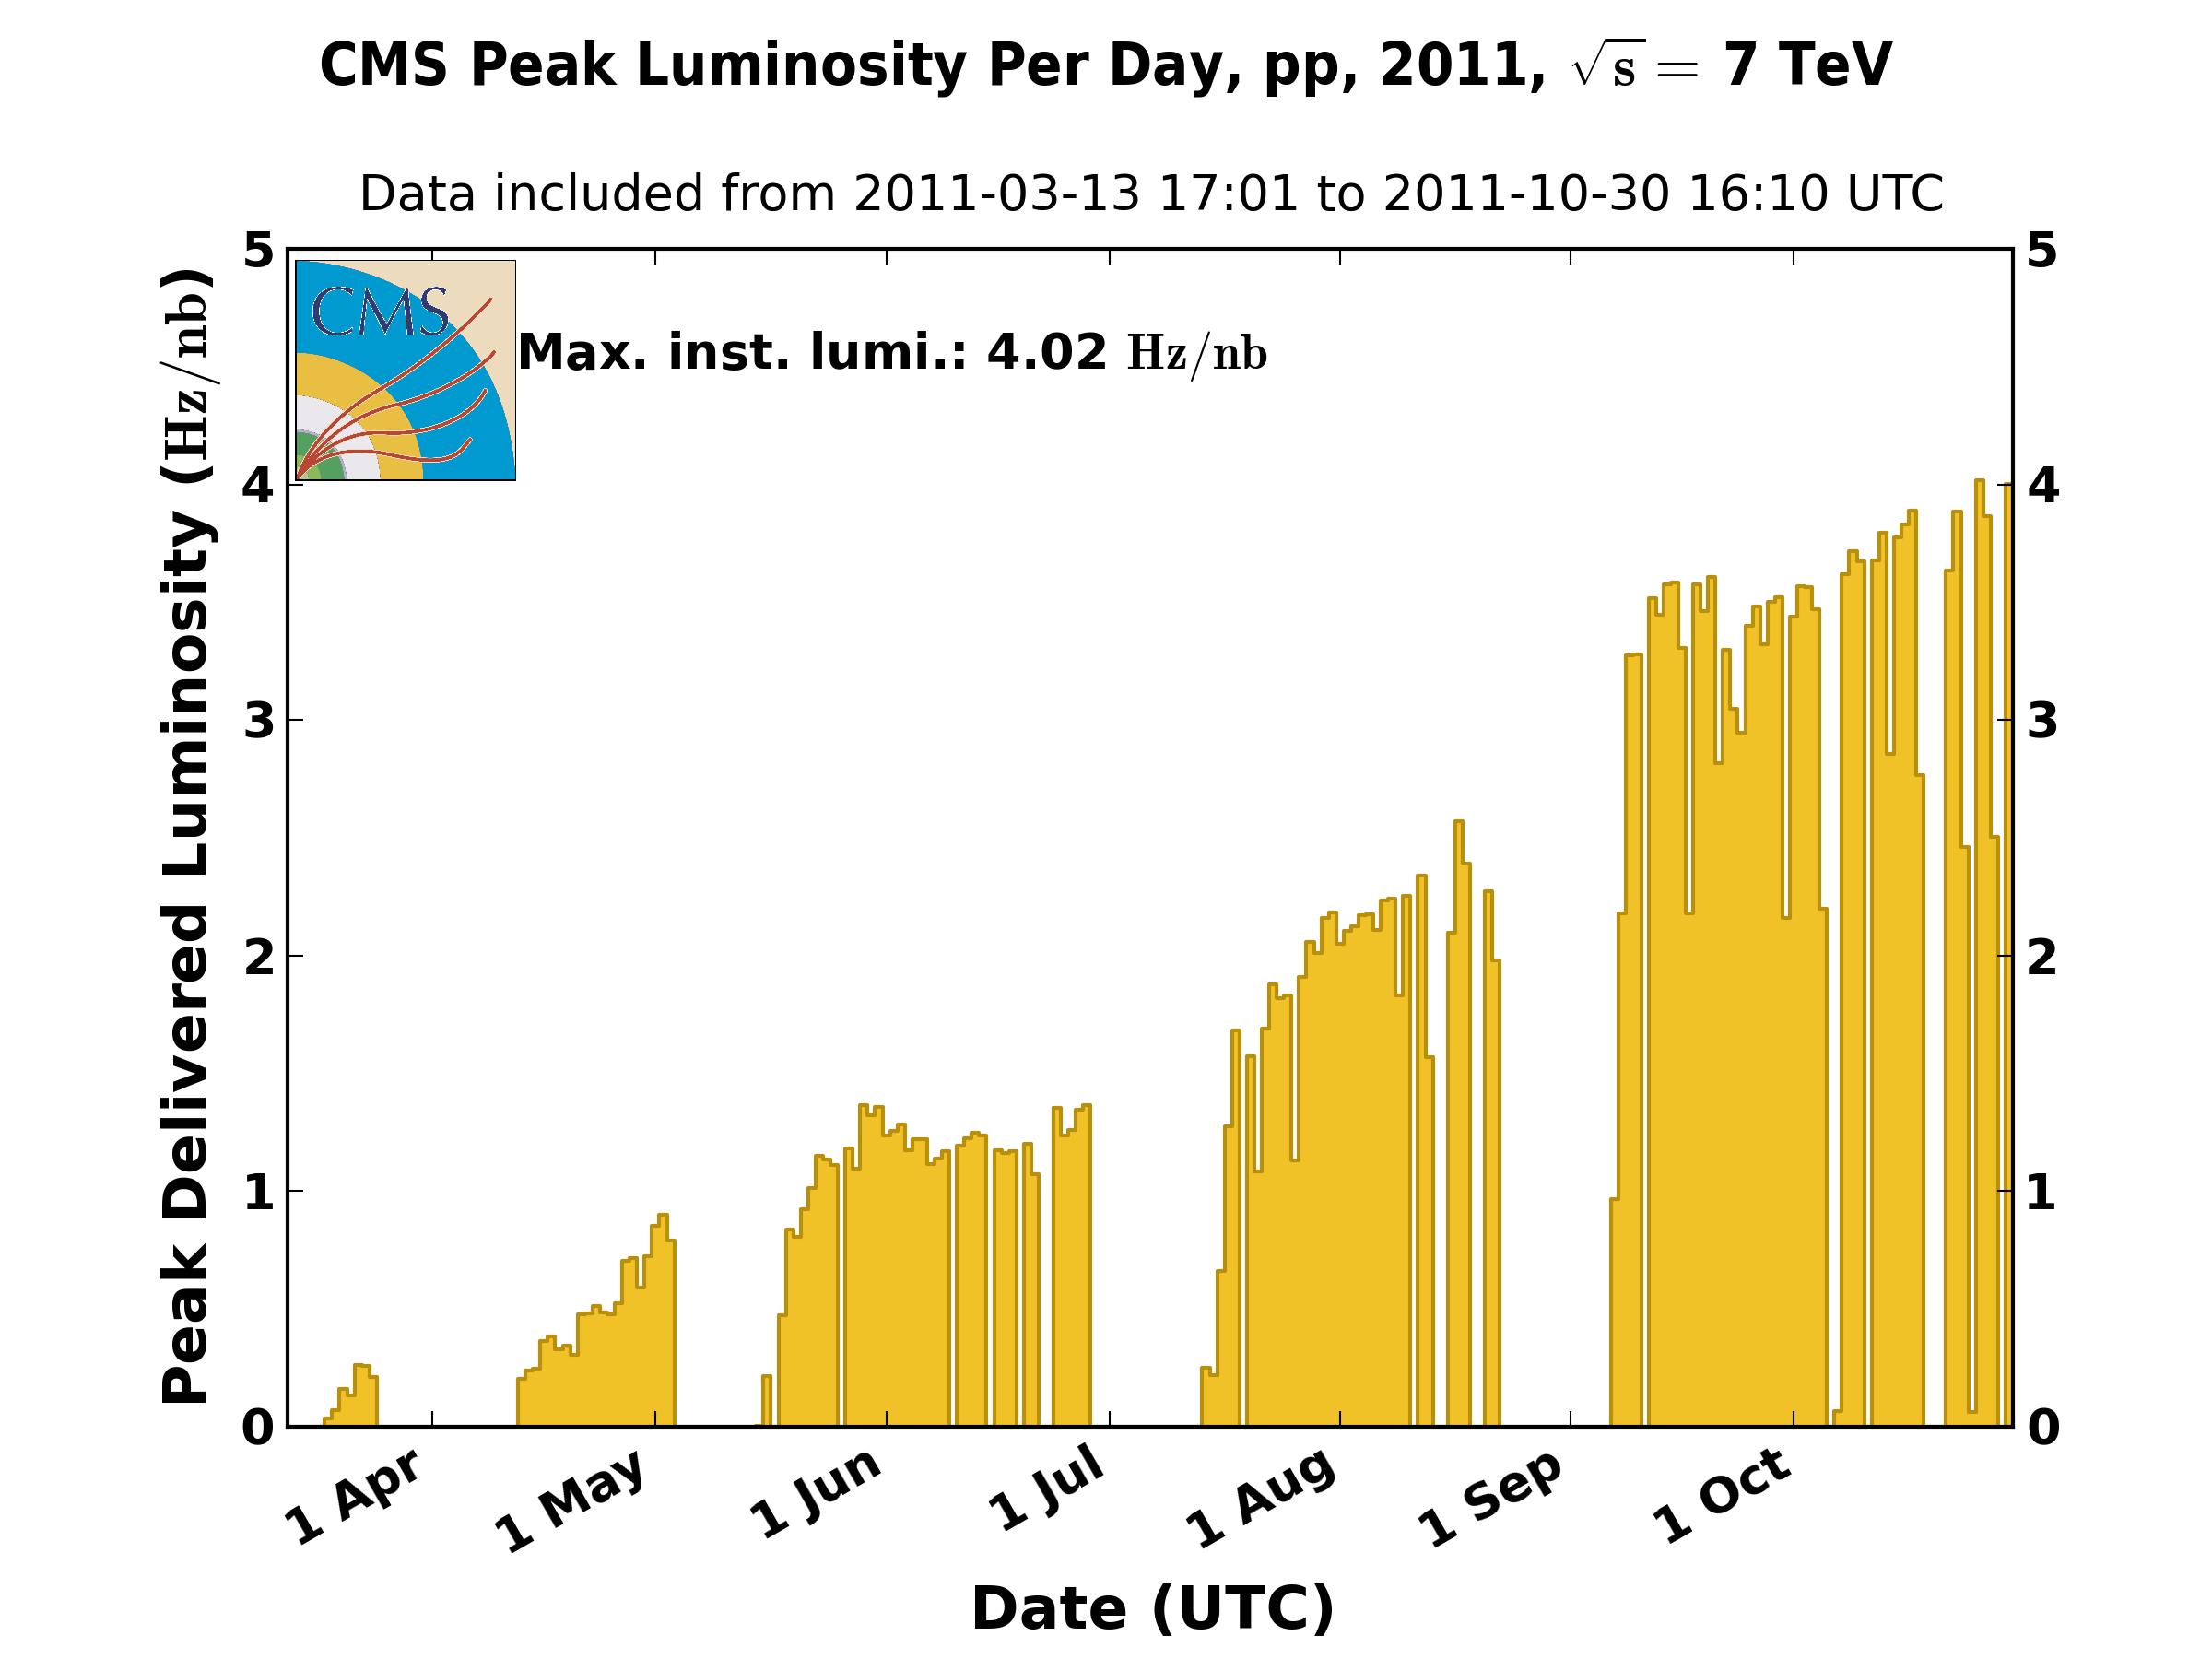 https://cern.ch/cmslumi/publicplots/peak_lumi_per_day_pp_2011.png